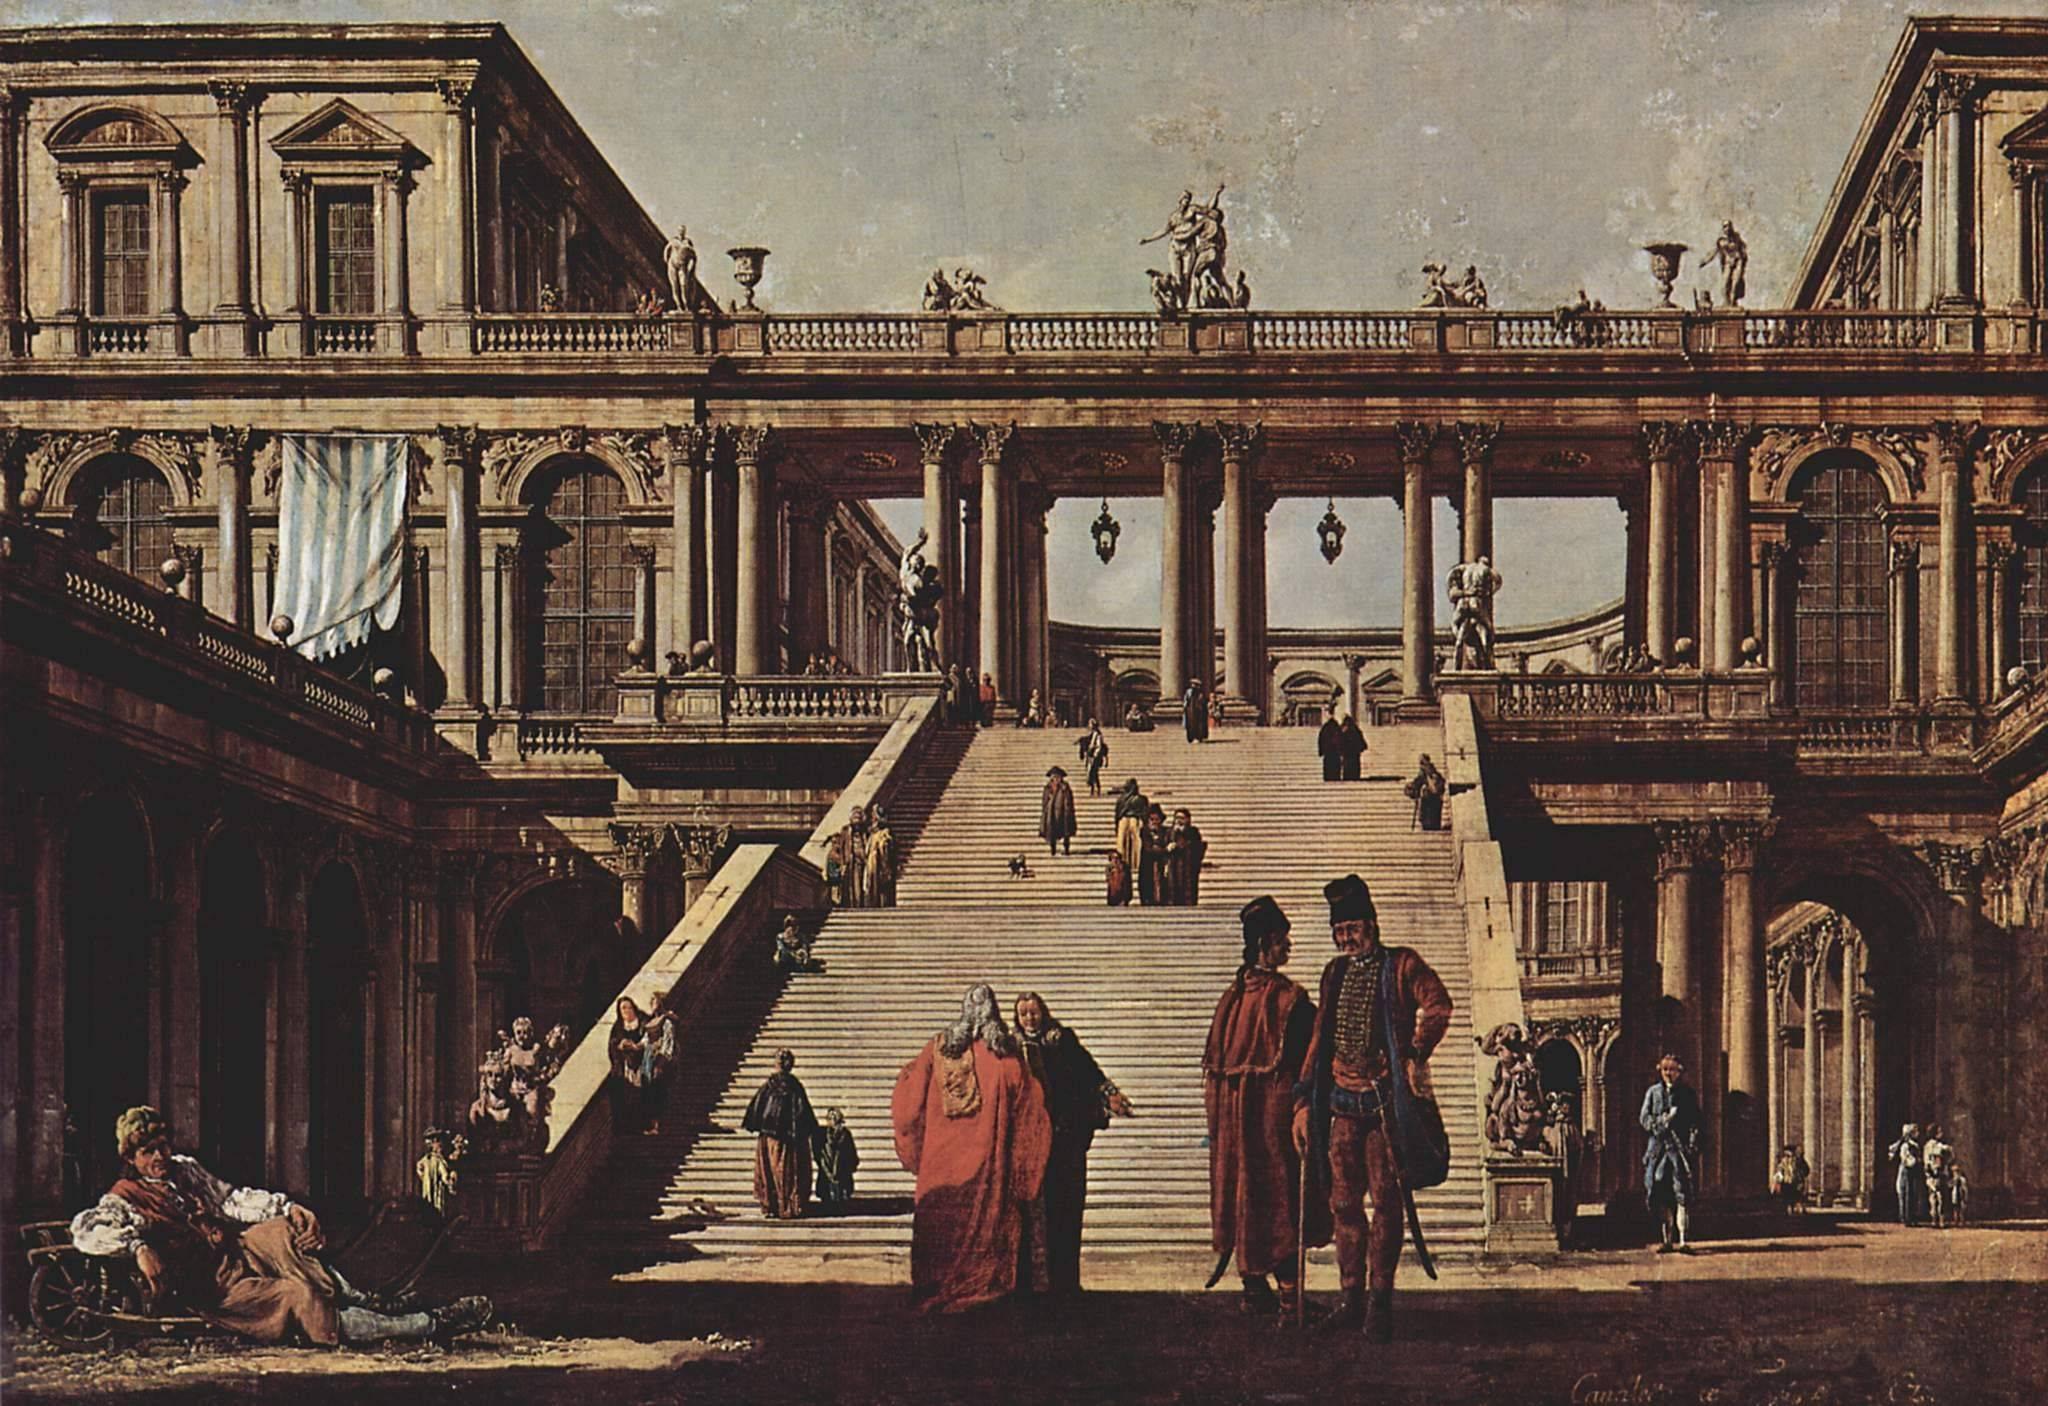 Музей кунстхалле в гамбурге – архитектура галереи